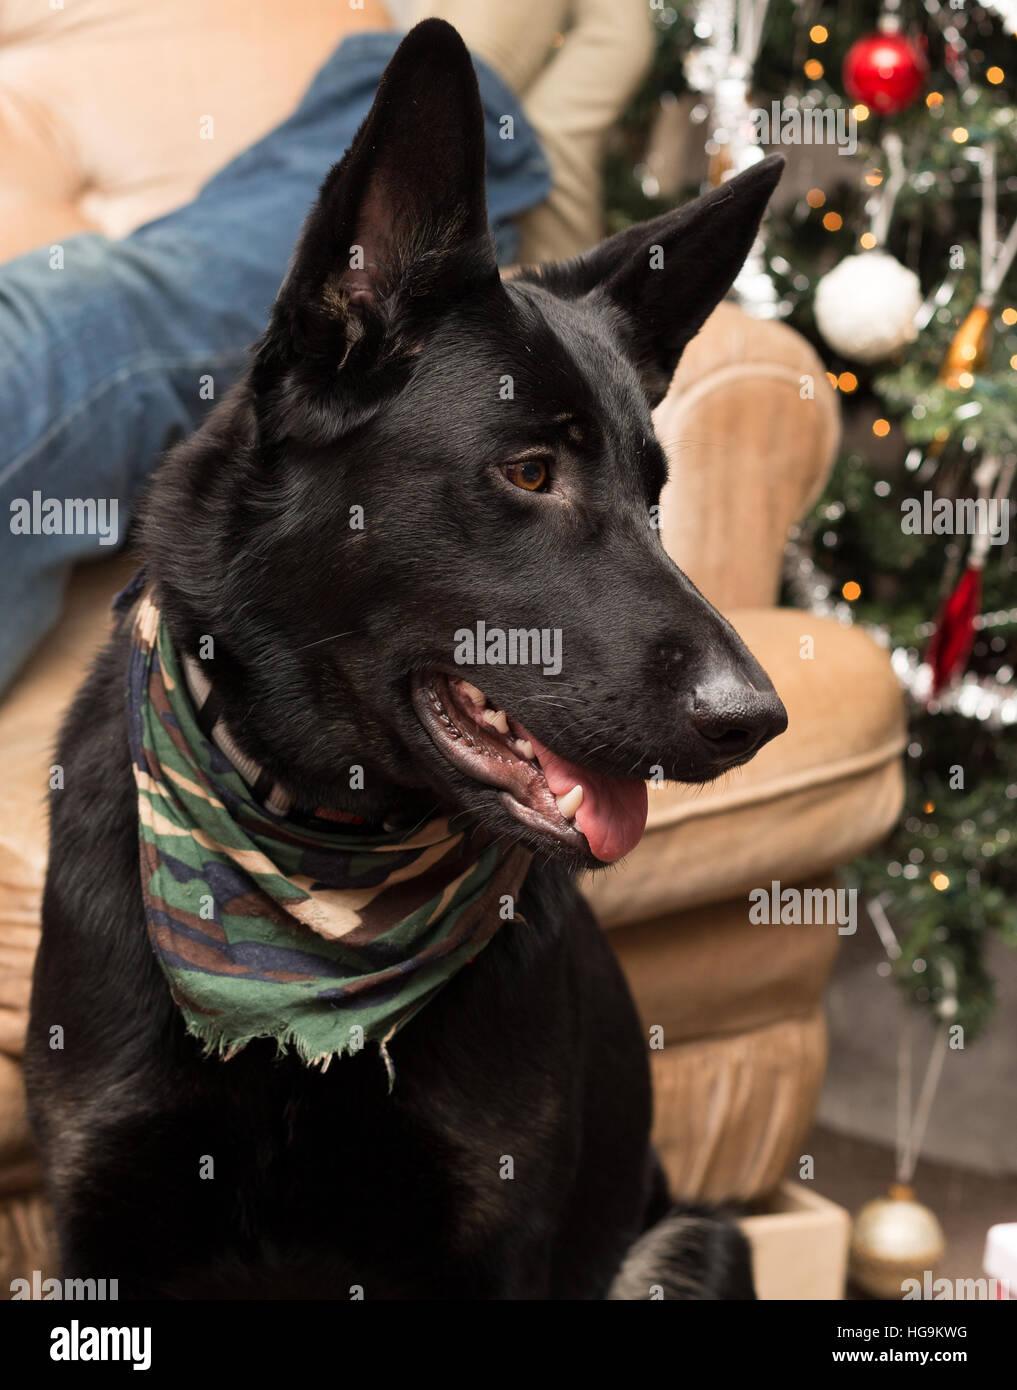 Puppy german shepherd dog. - Stock Image